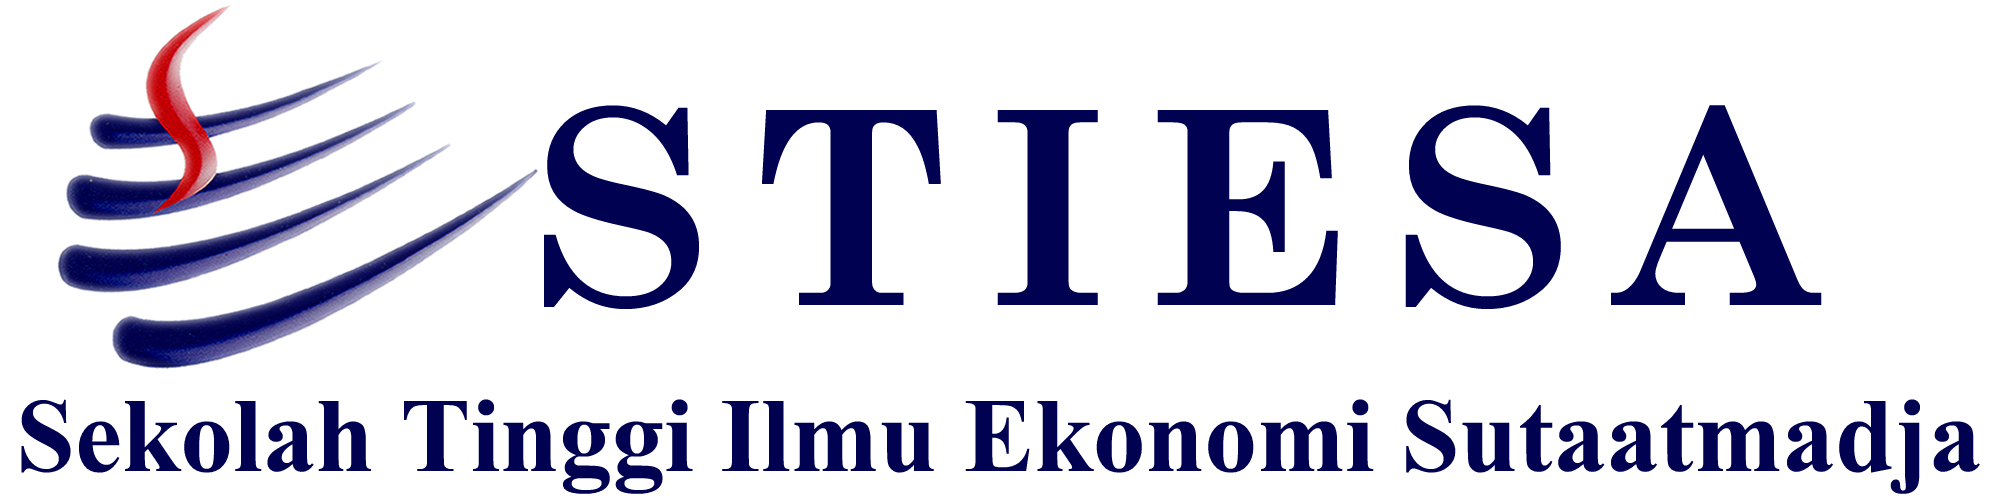 Pendaftaran Sekolah Tinggi Ilmu Ekonomi Sutaatmadja ( STIESA )